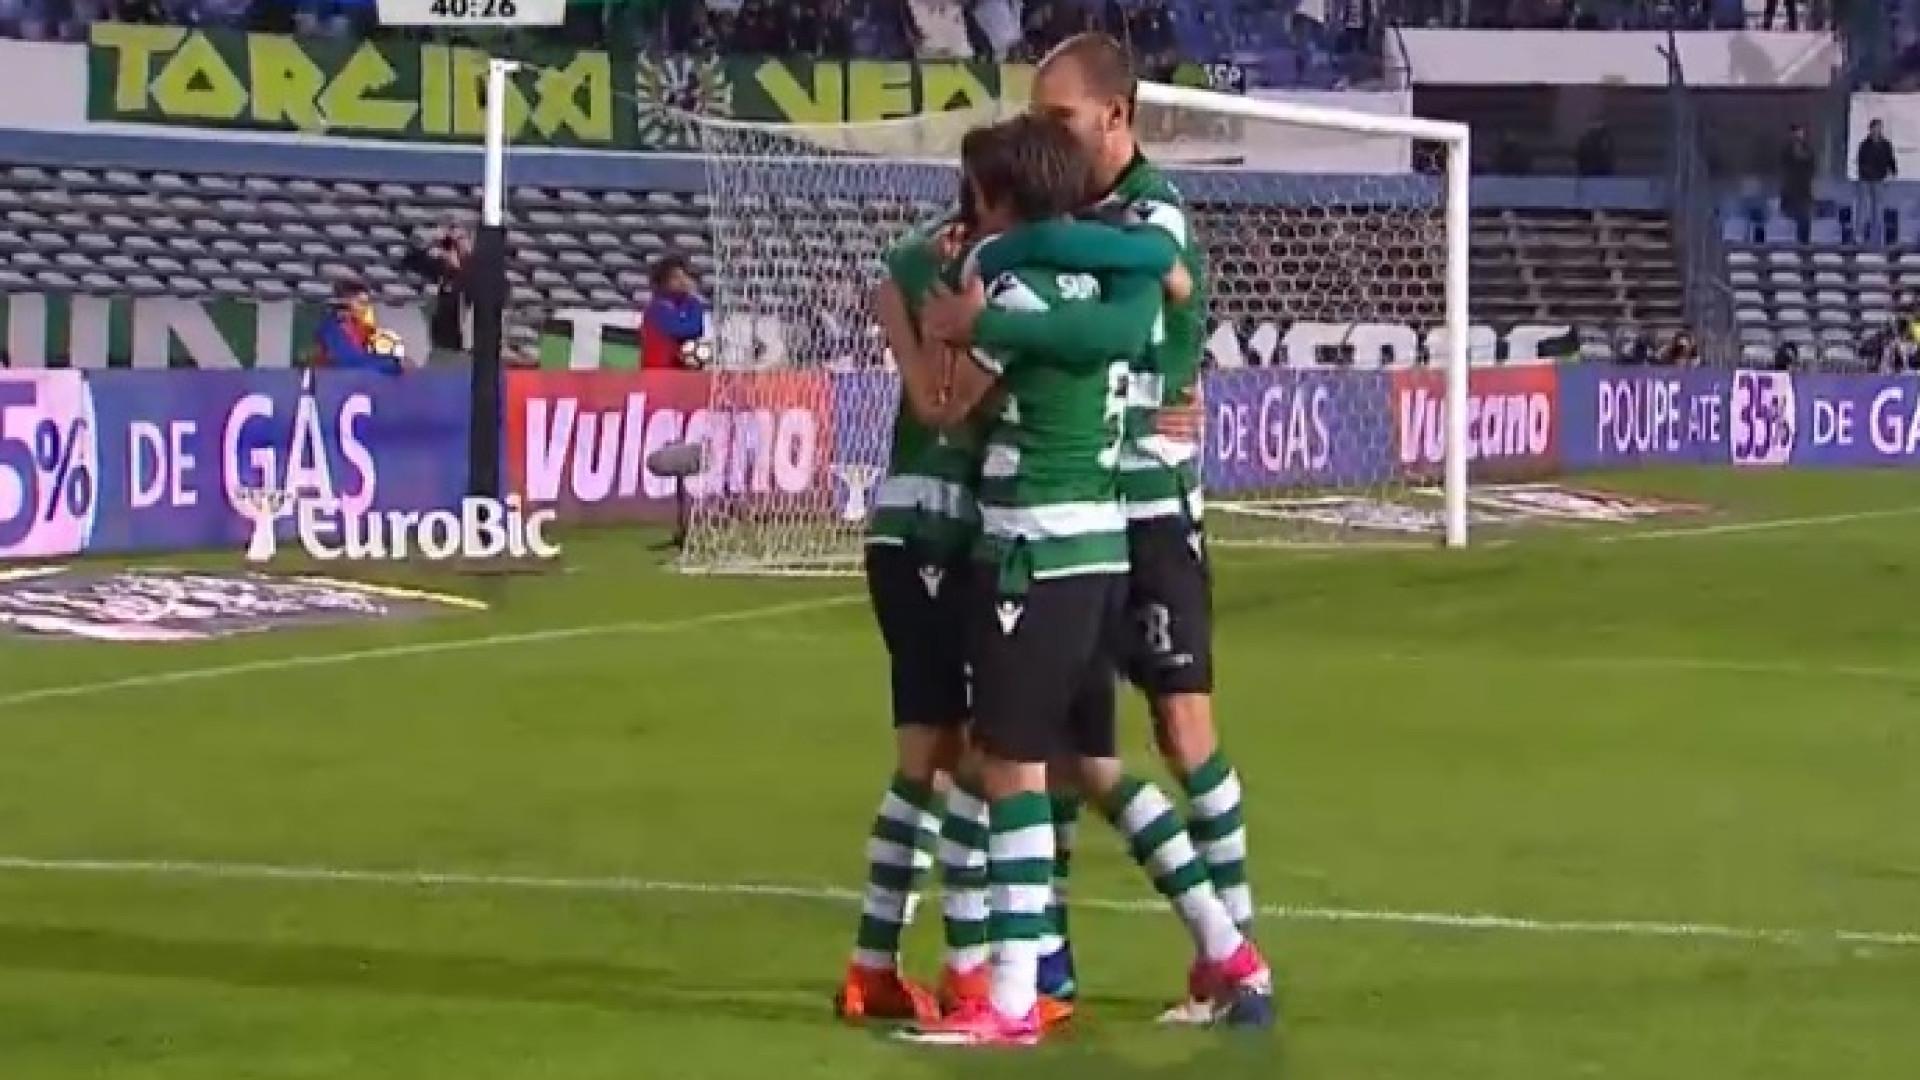 Assim foi o terceiro golo do Sporting marcado por Acuña